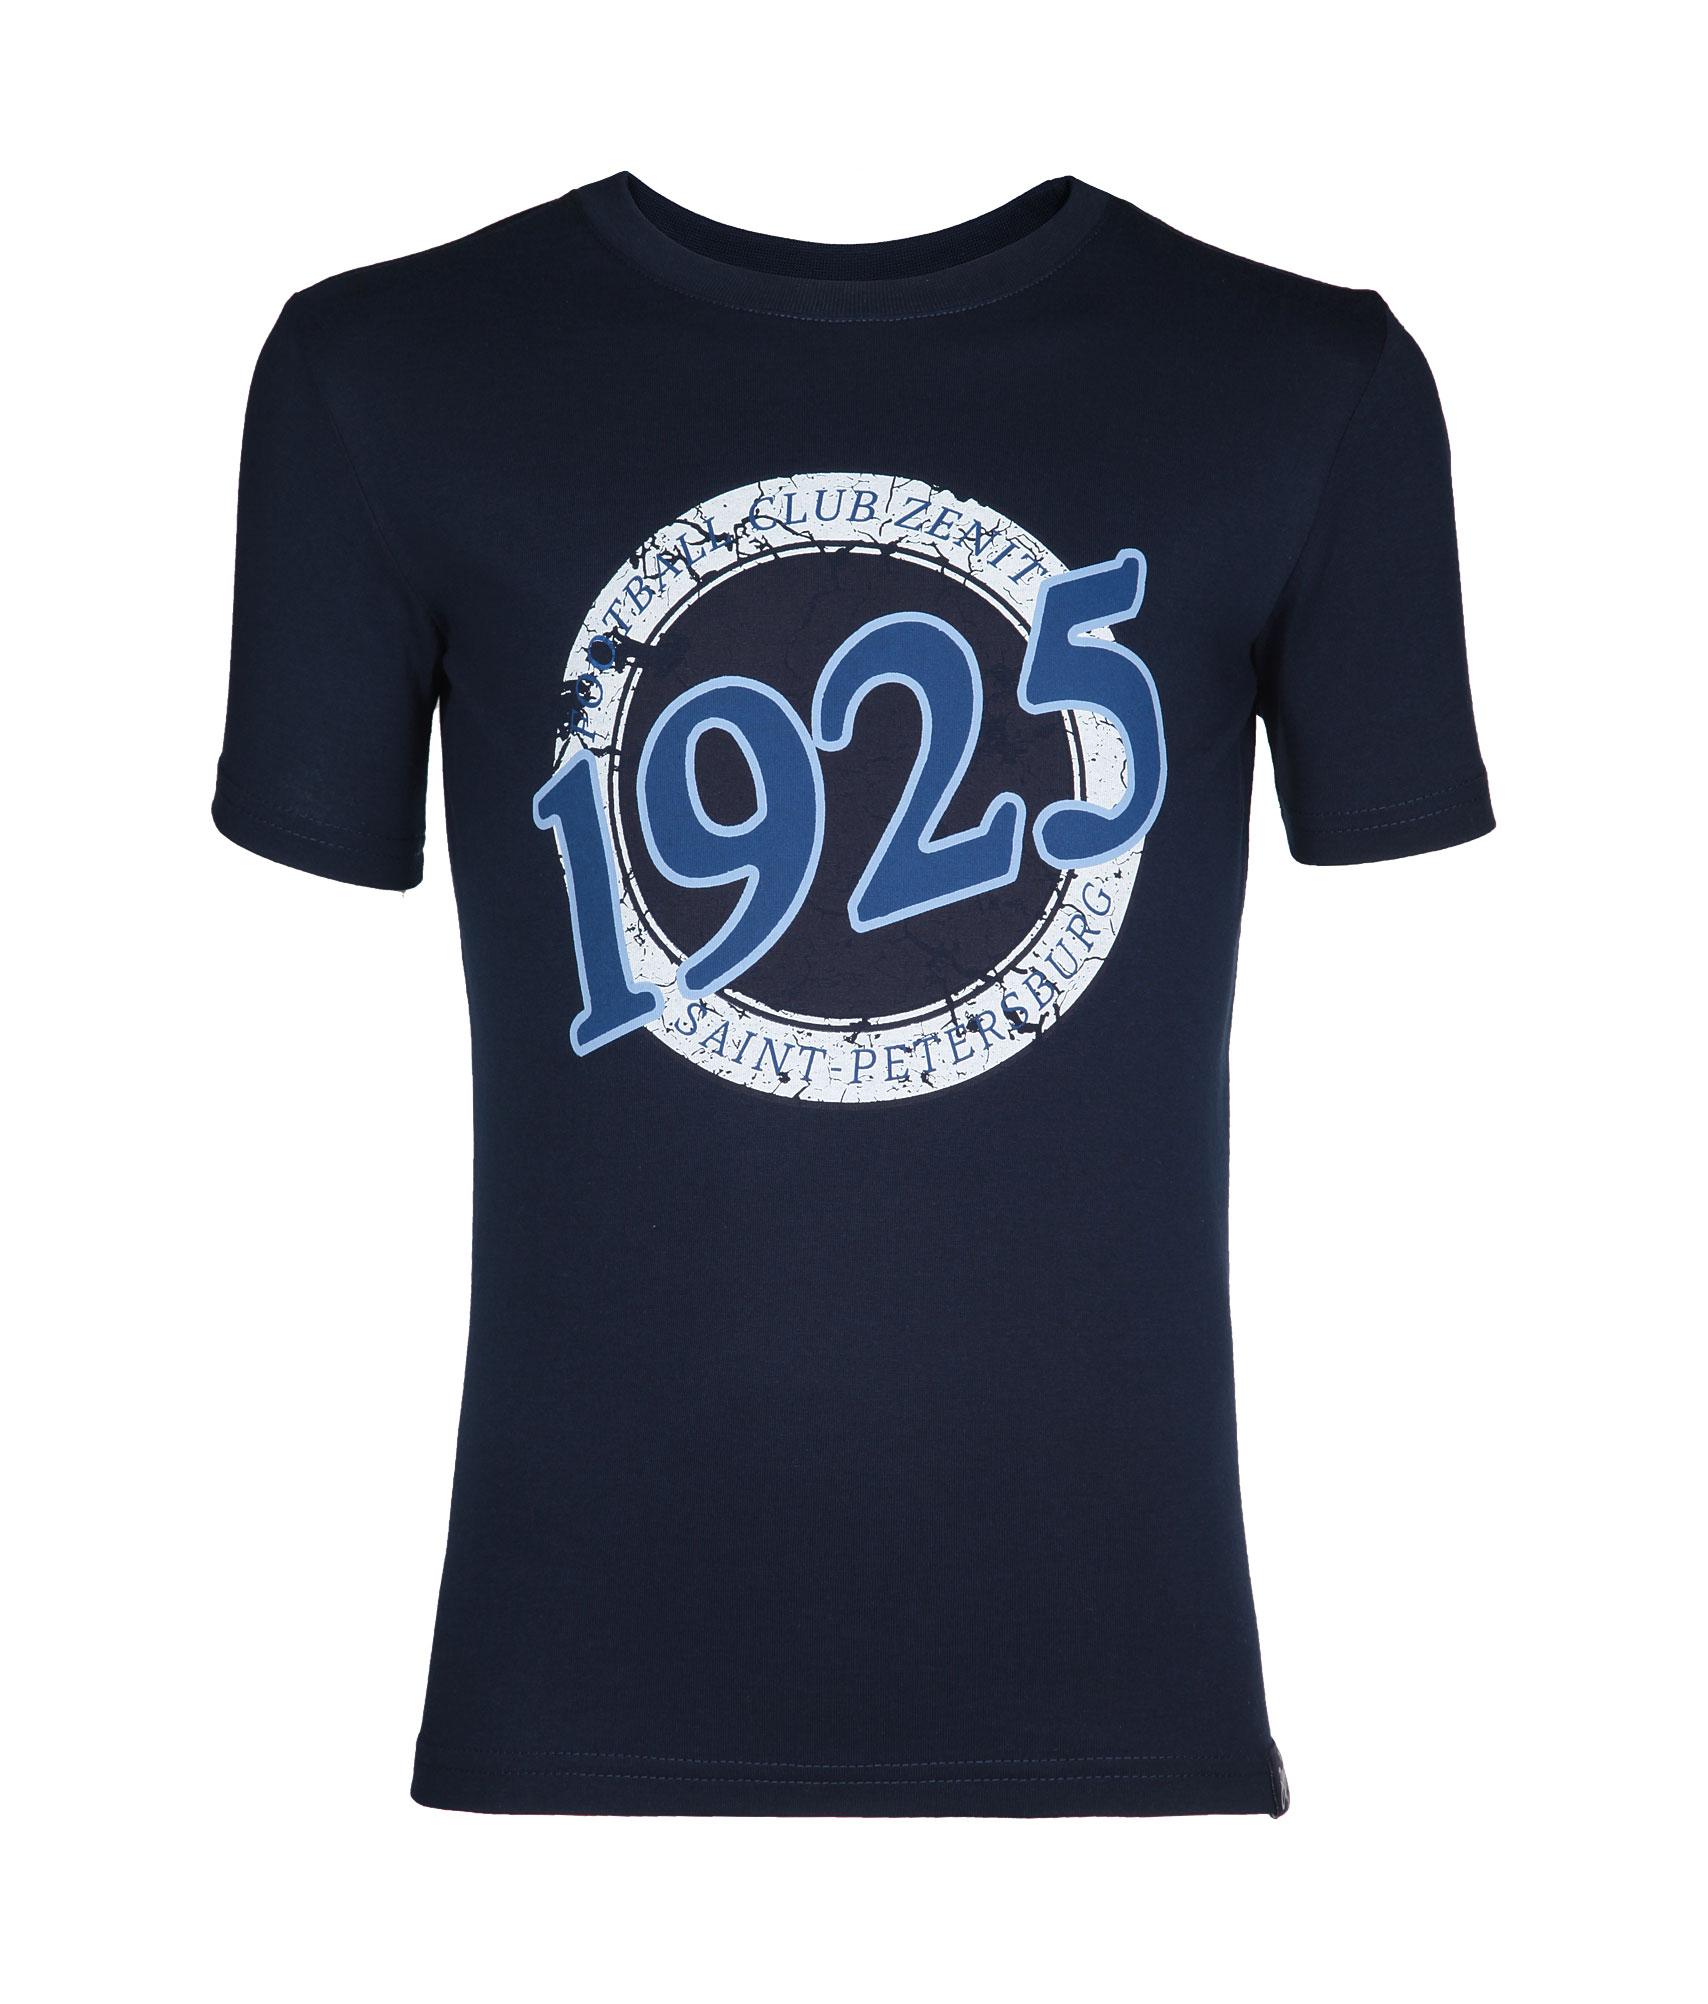 Футболка подростковая, Цвет-Темно-Синий, Размер-134-140